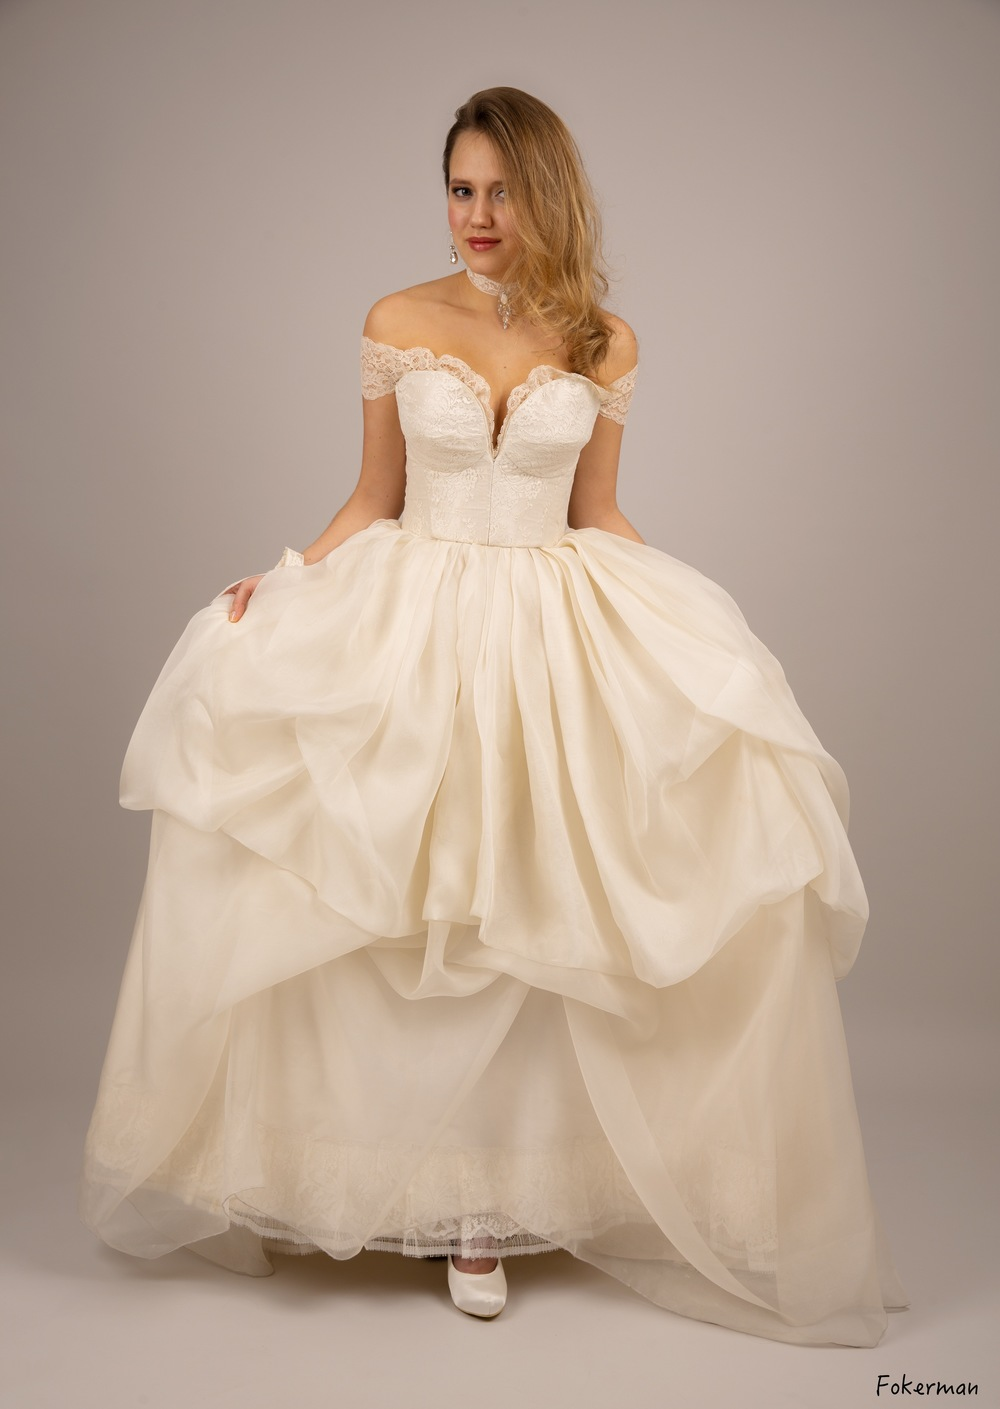 Robe de mariée Anastasia manchettes dentelle organza face Agnes Szabelewski.jpg